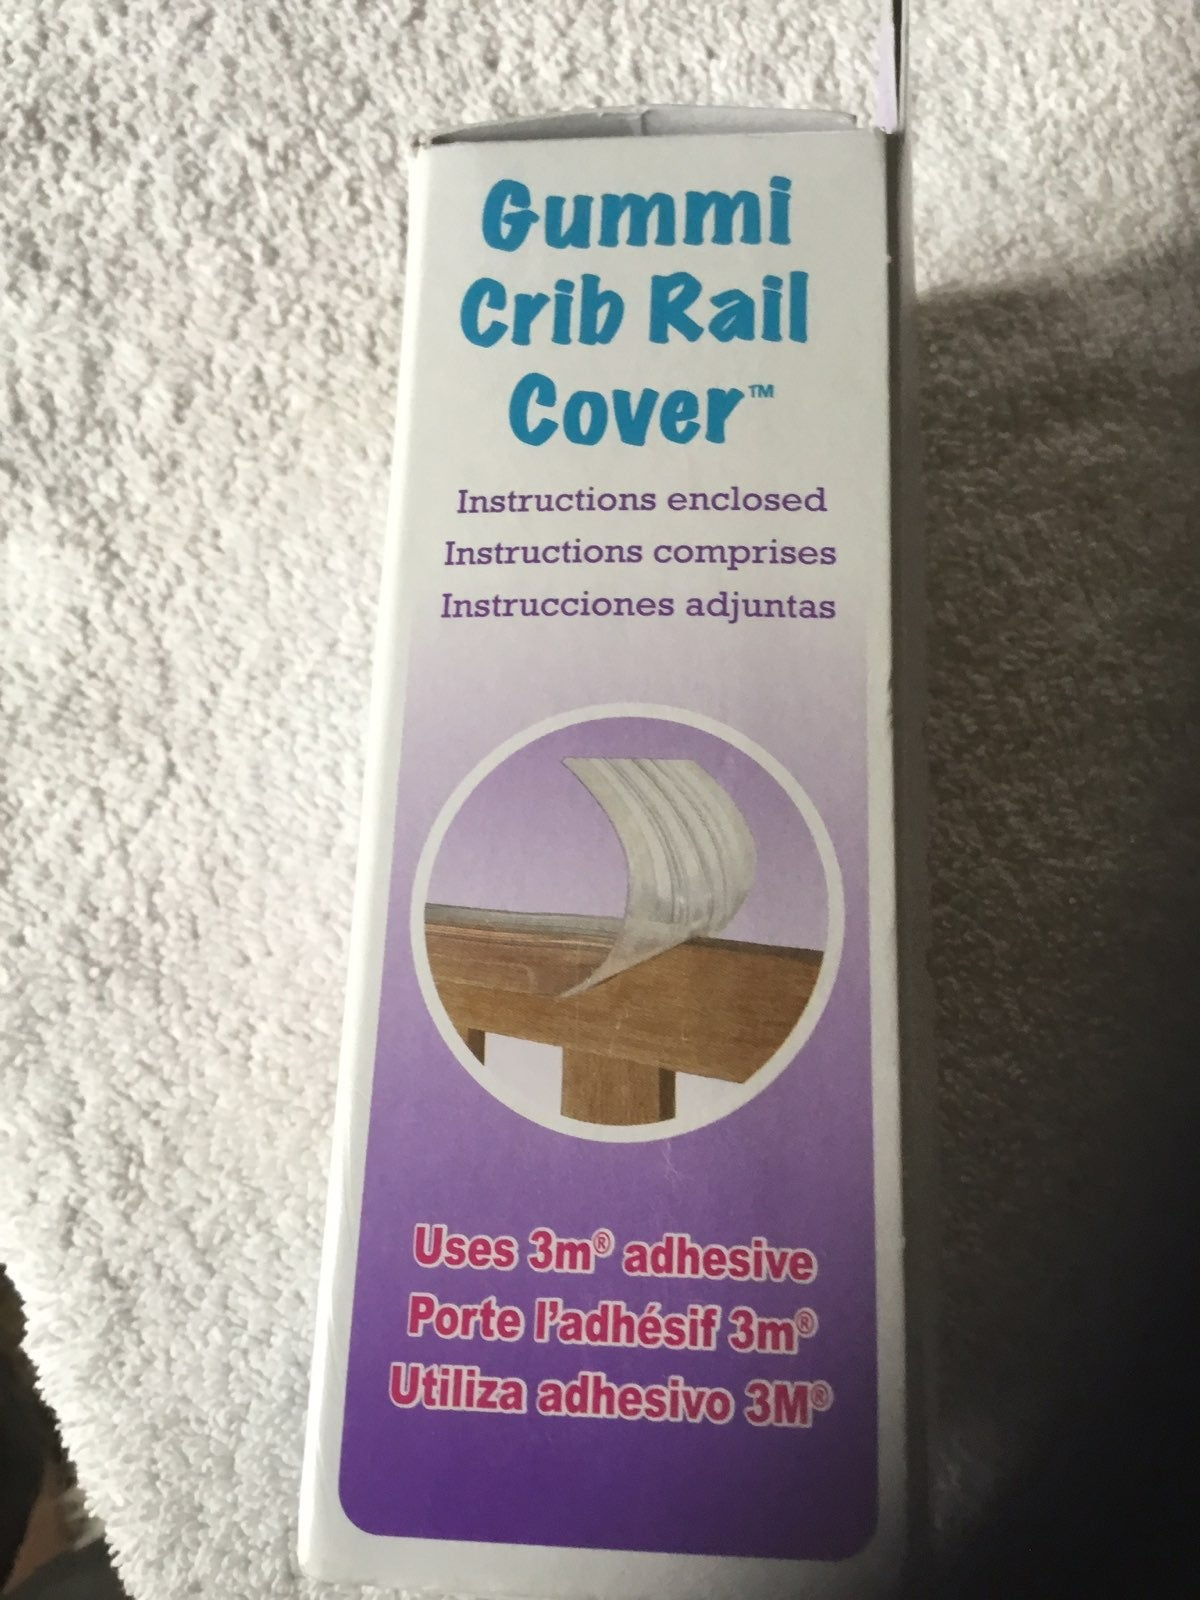 Kidkusion crib rail cover